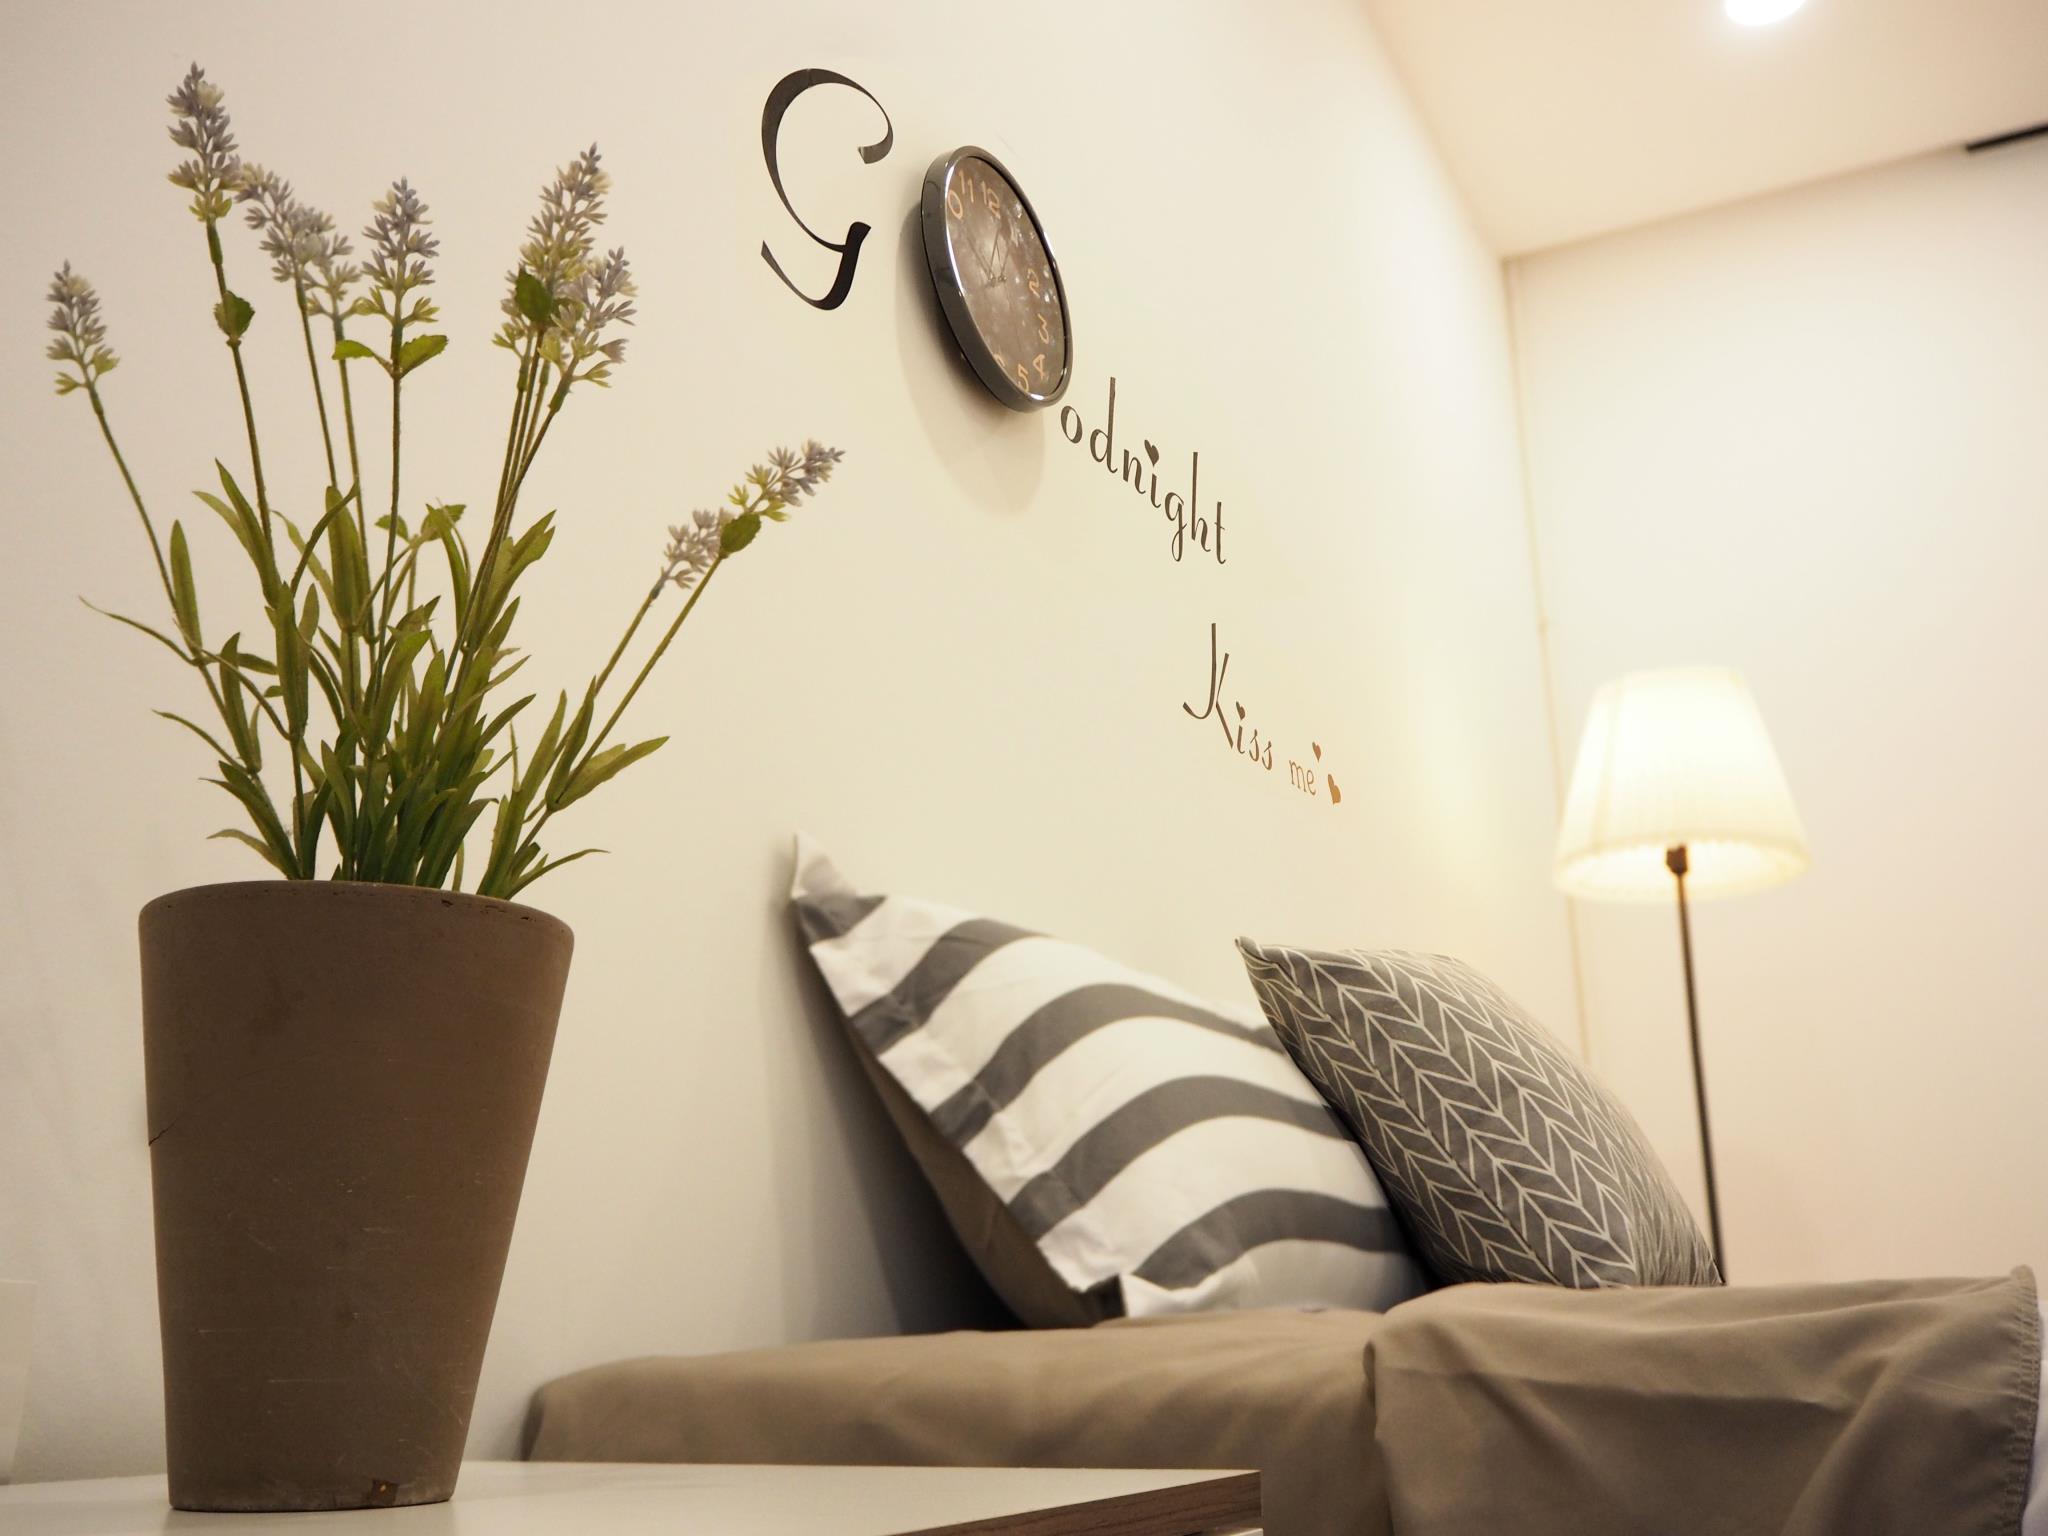 KL Gateway Residences Family Suite